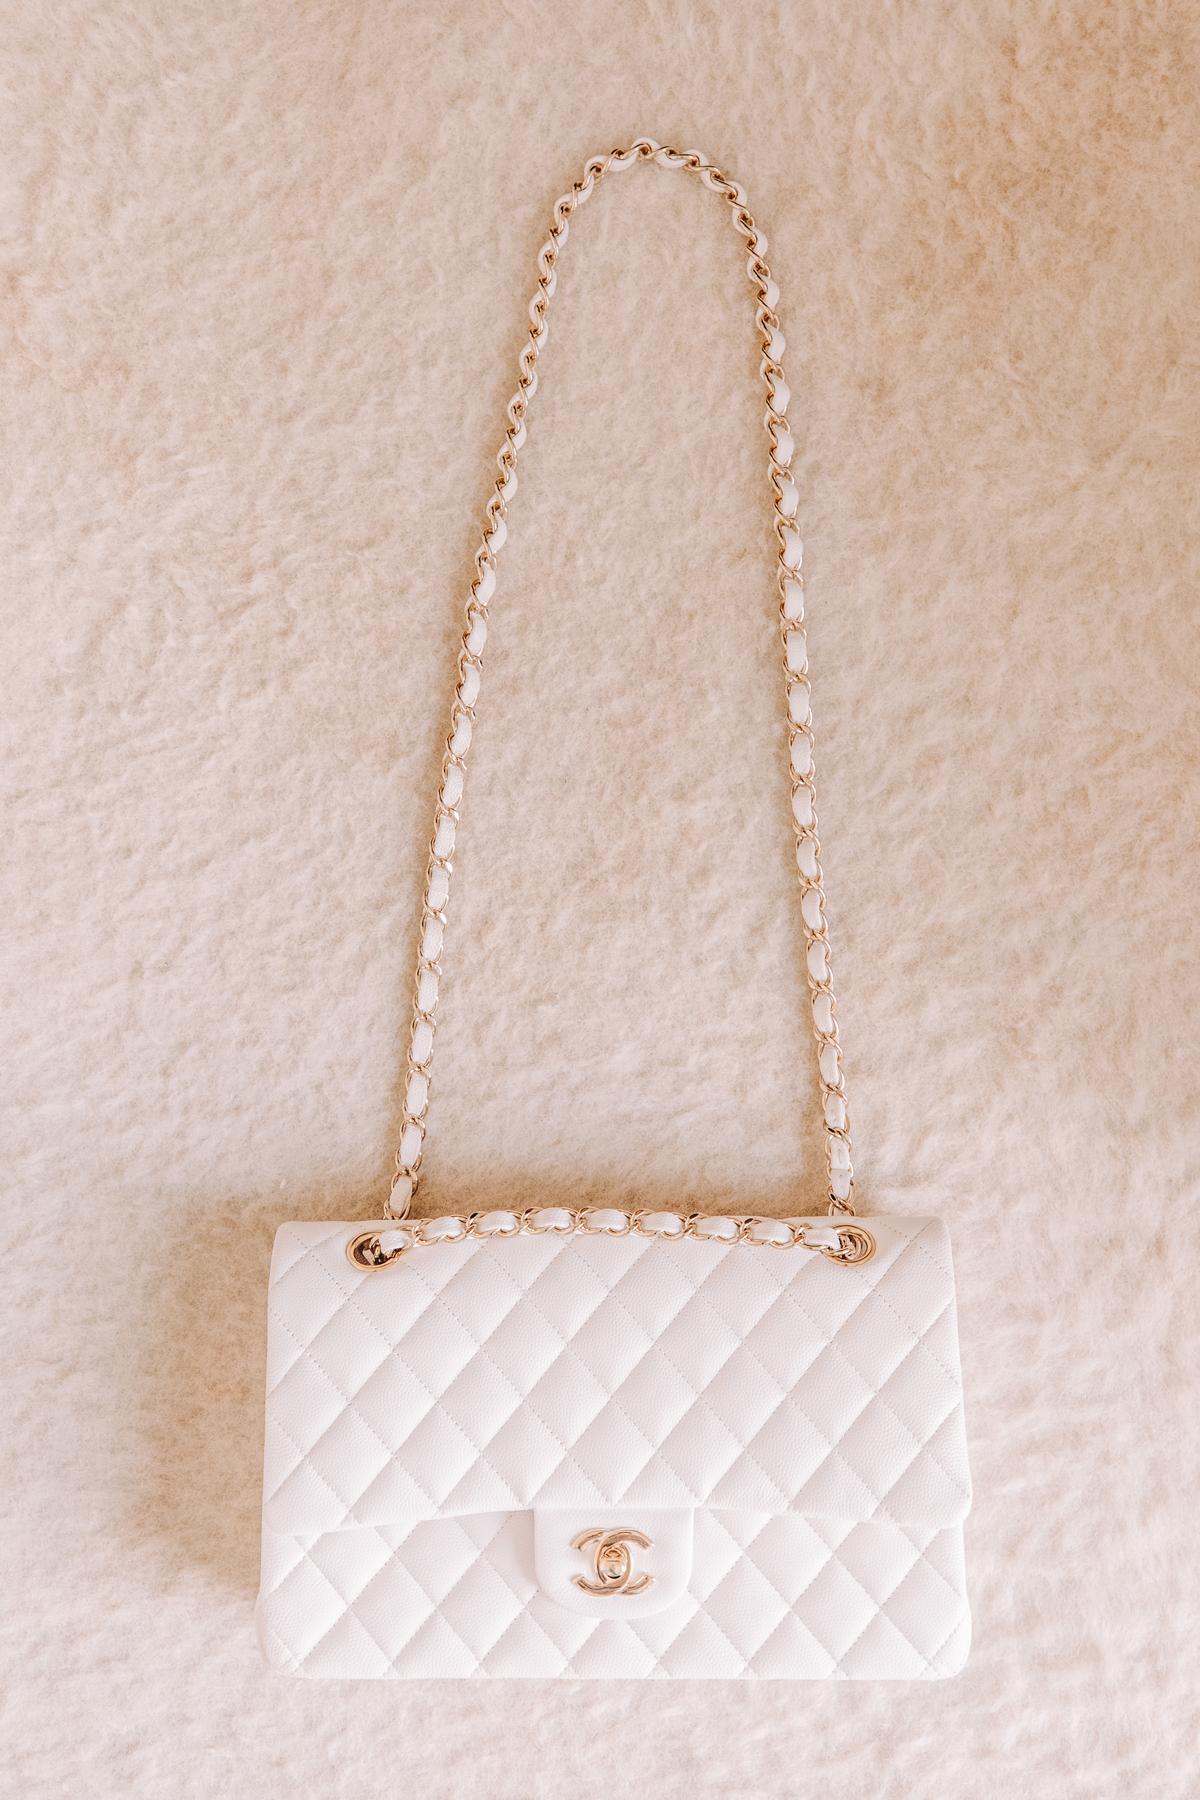 Fashion Jackson Chanel Classic Flap Medium White Handbag with Gold Hardware